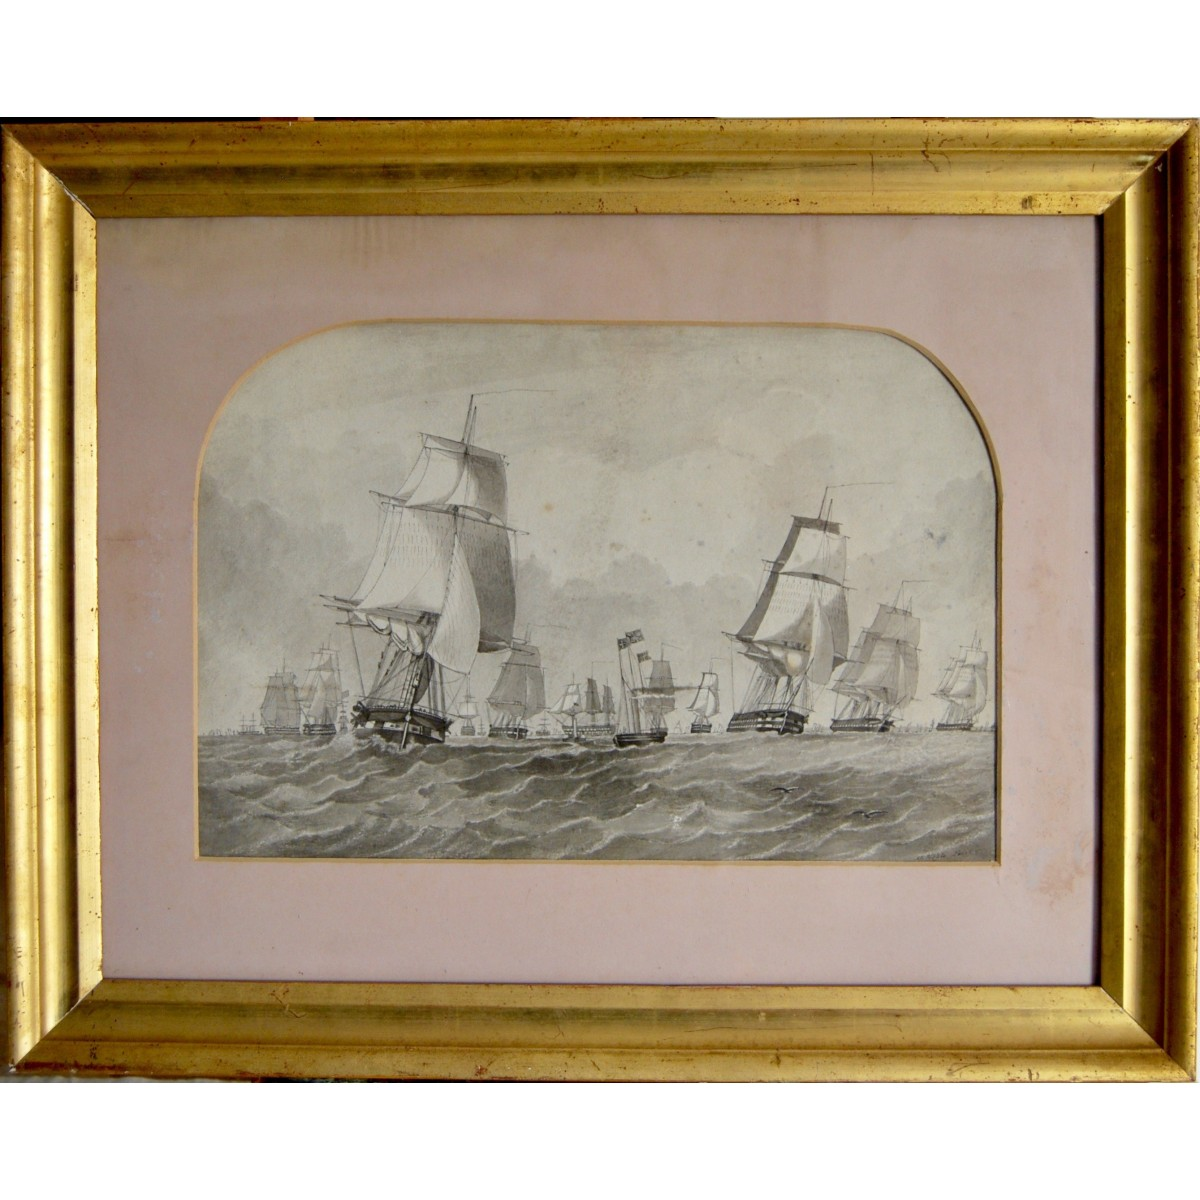 Marina con veleros, acuarela, del siglo XIX.